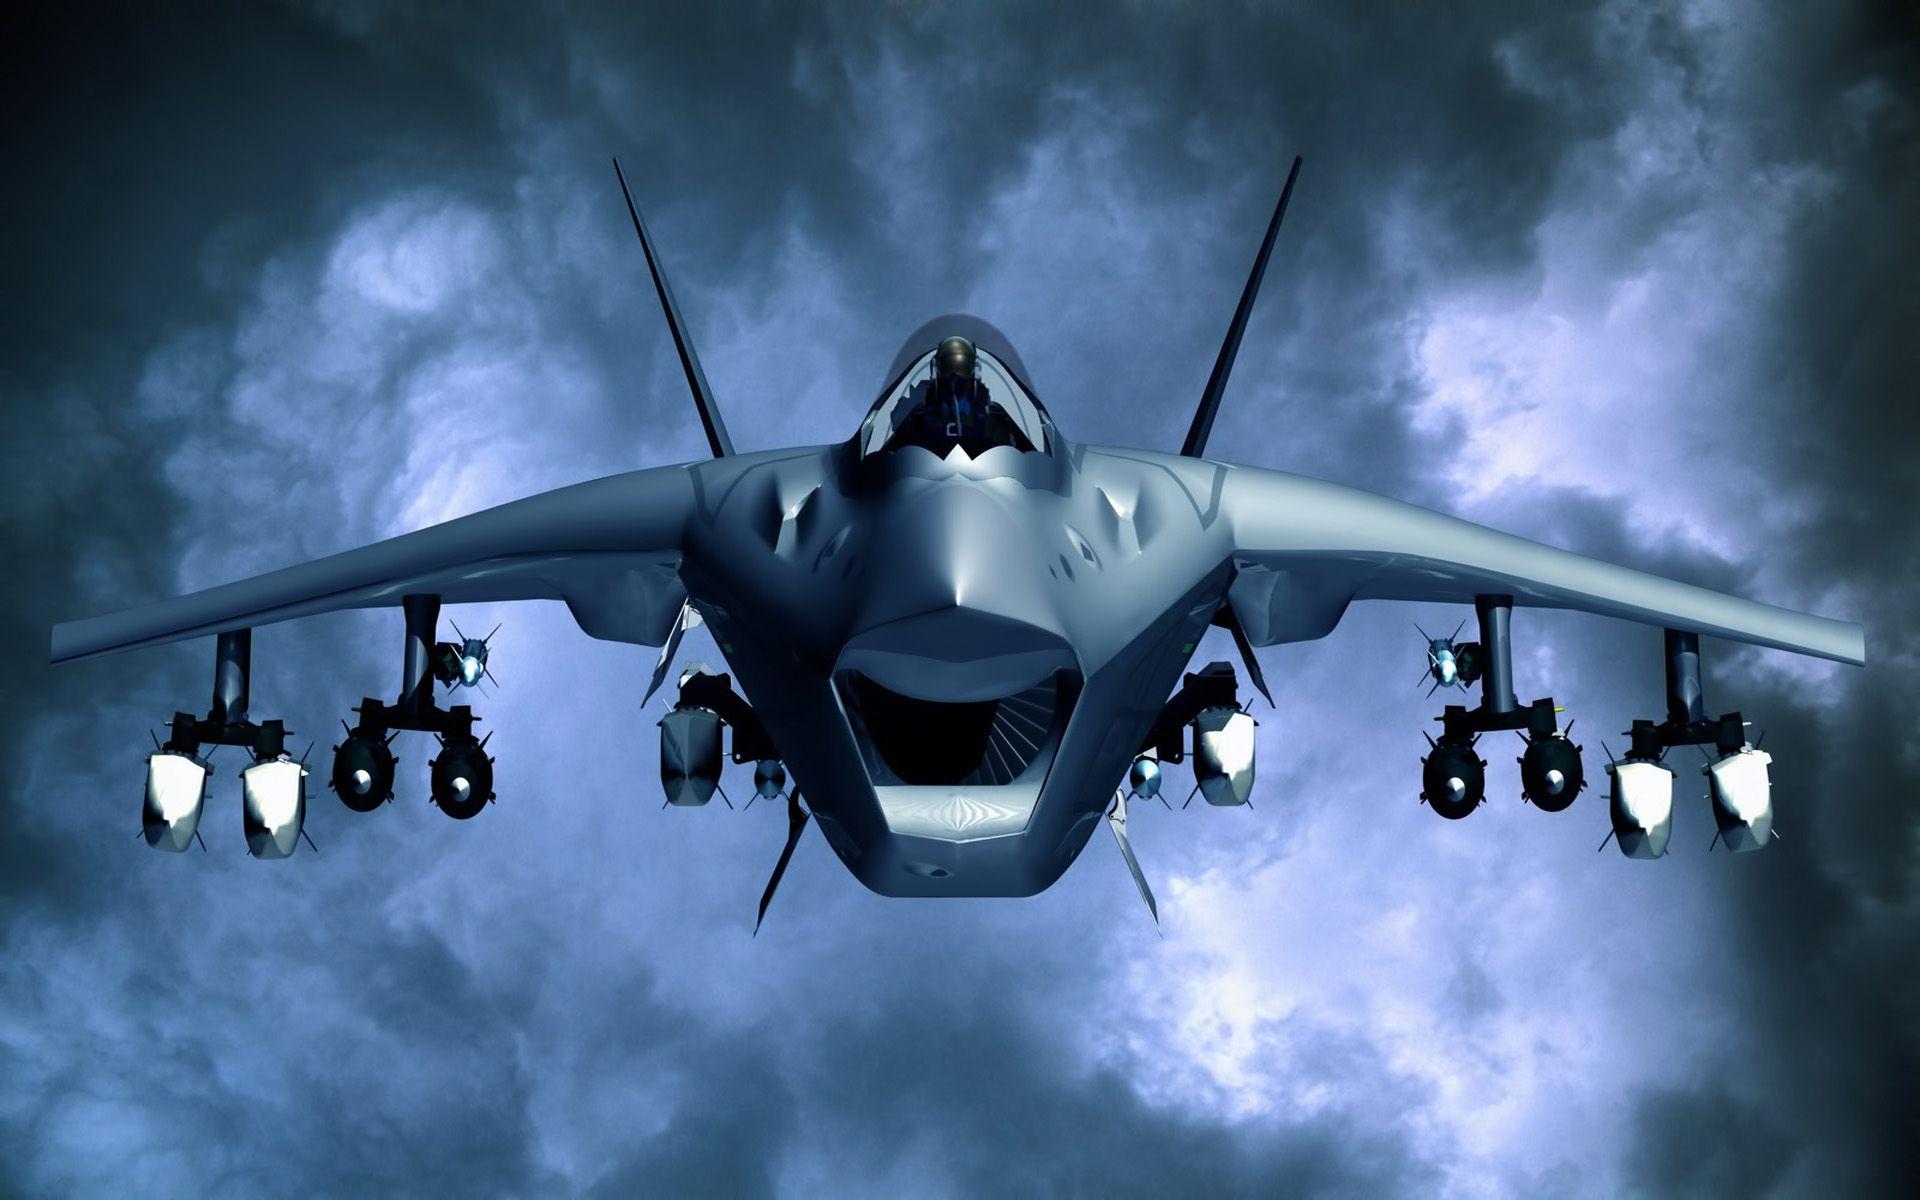 F 31 Google Image Result for http://wallpaper-million.com/Wallpapers/f/Military/F31-fighter-wallpaper_4325.jpg